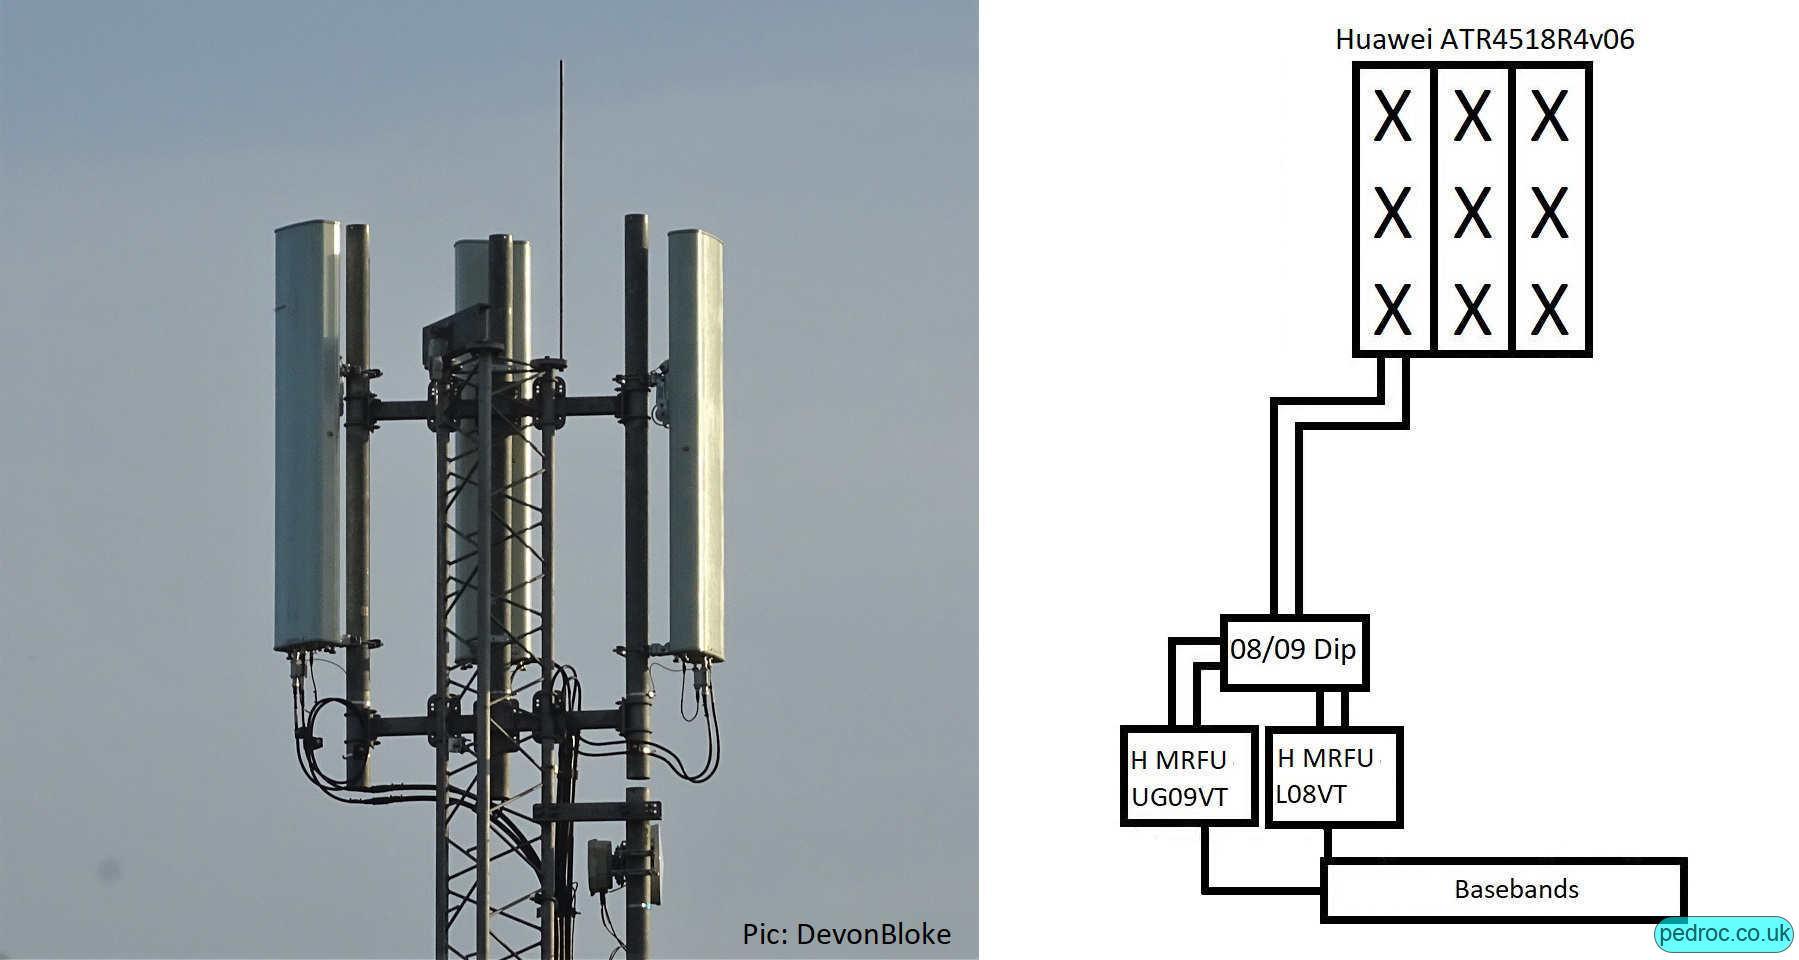 Vodafone Huawei low band site with Huawei ATR4518R4v06 antennas.